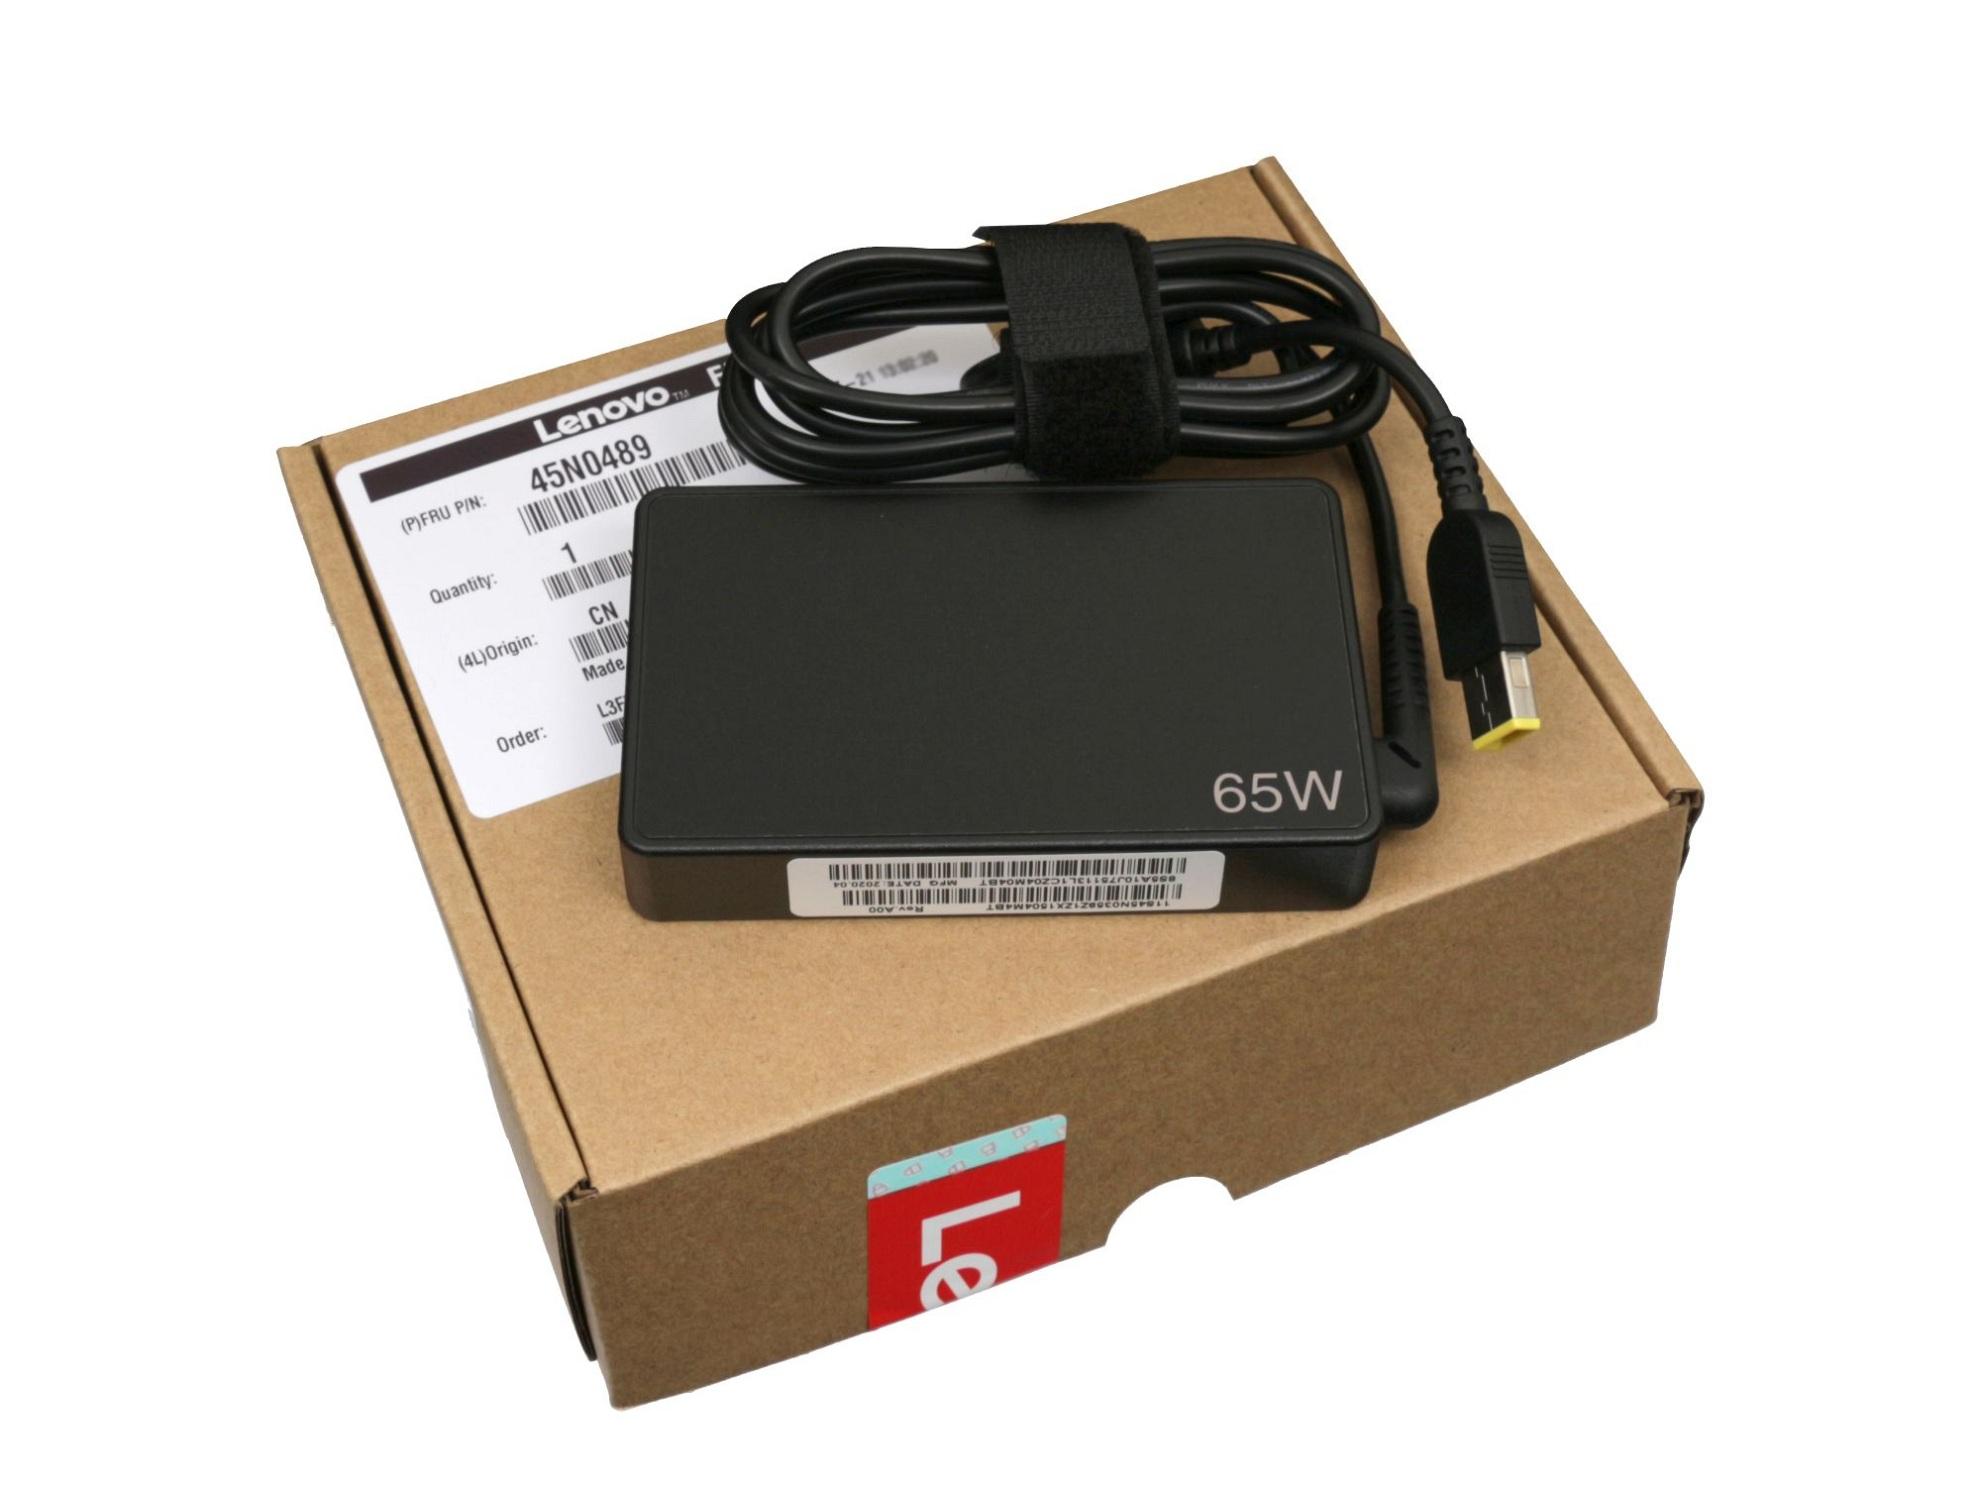 Lenovo 36200351 Netzteil 65W - flache Variante